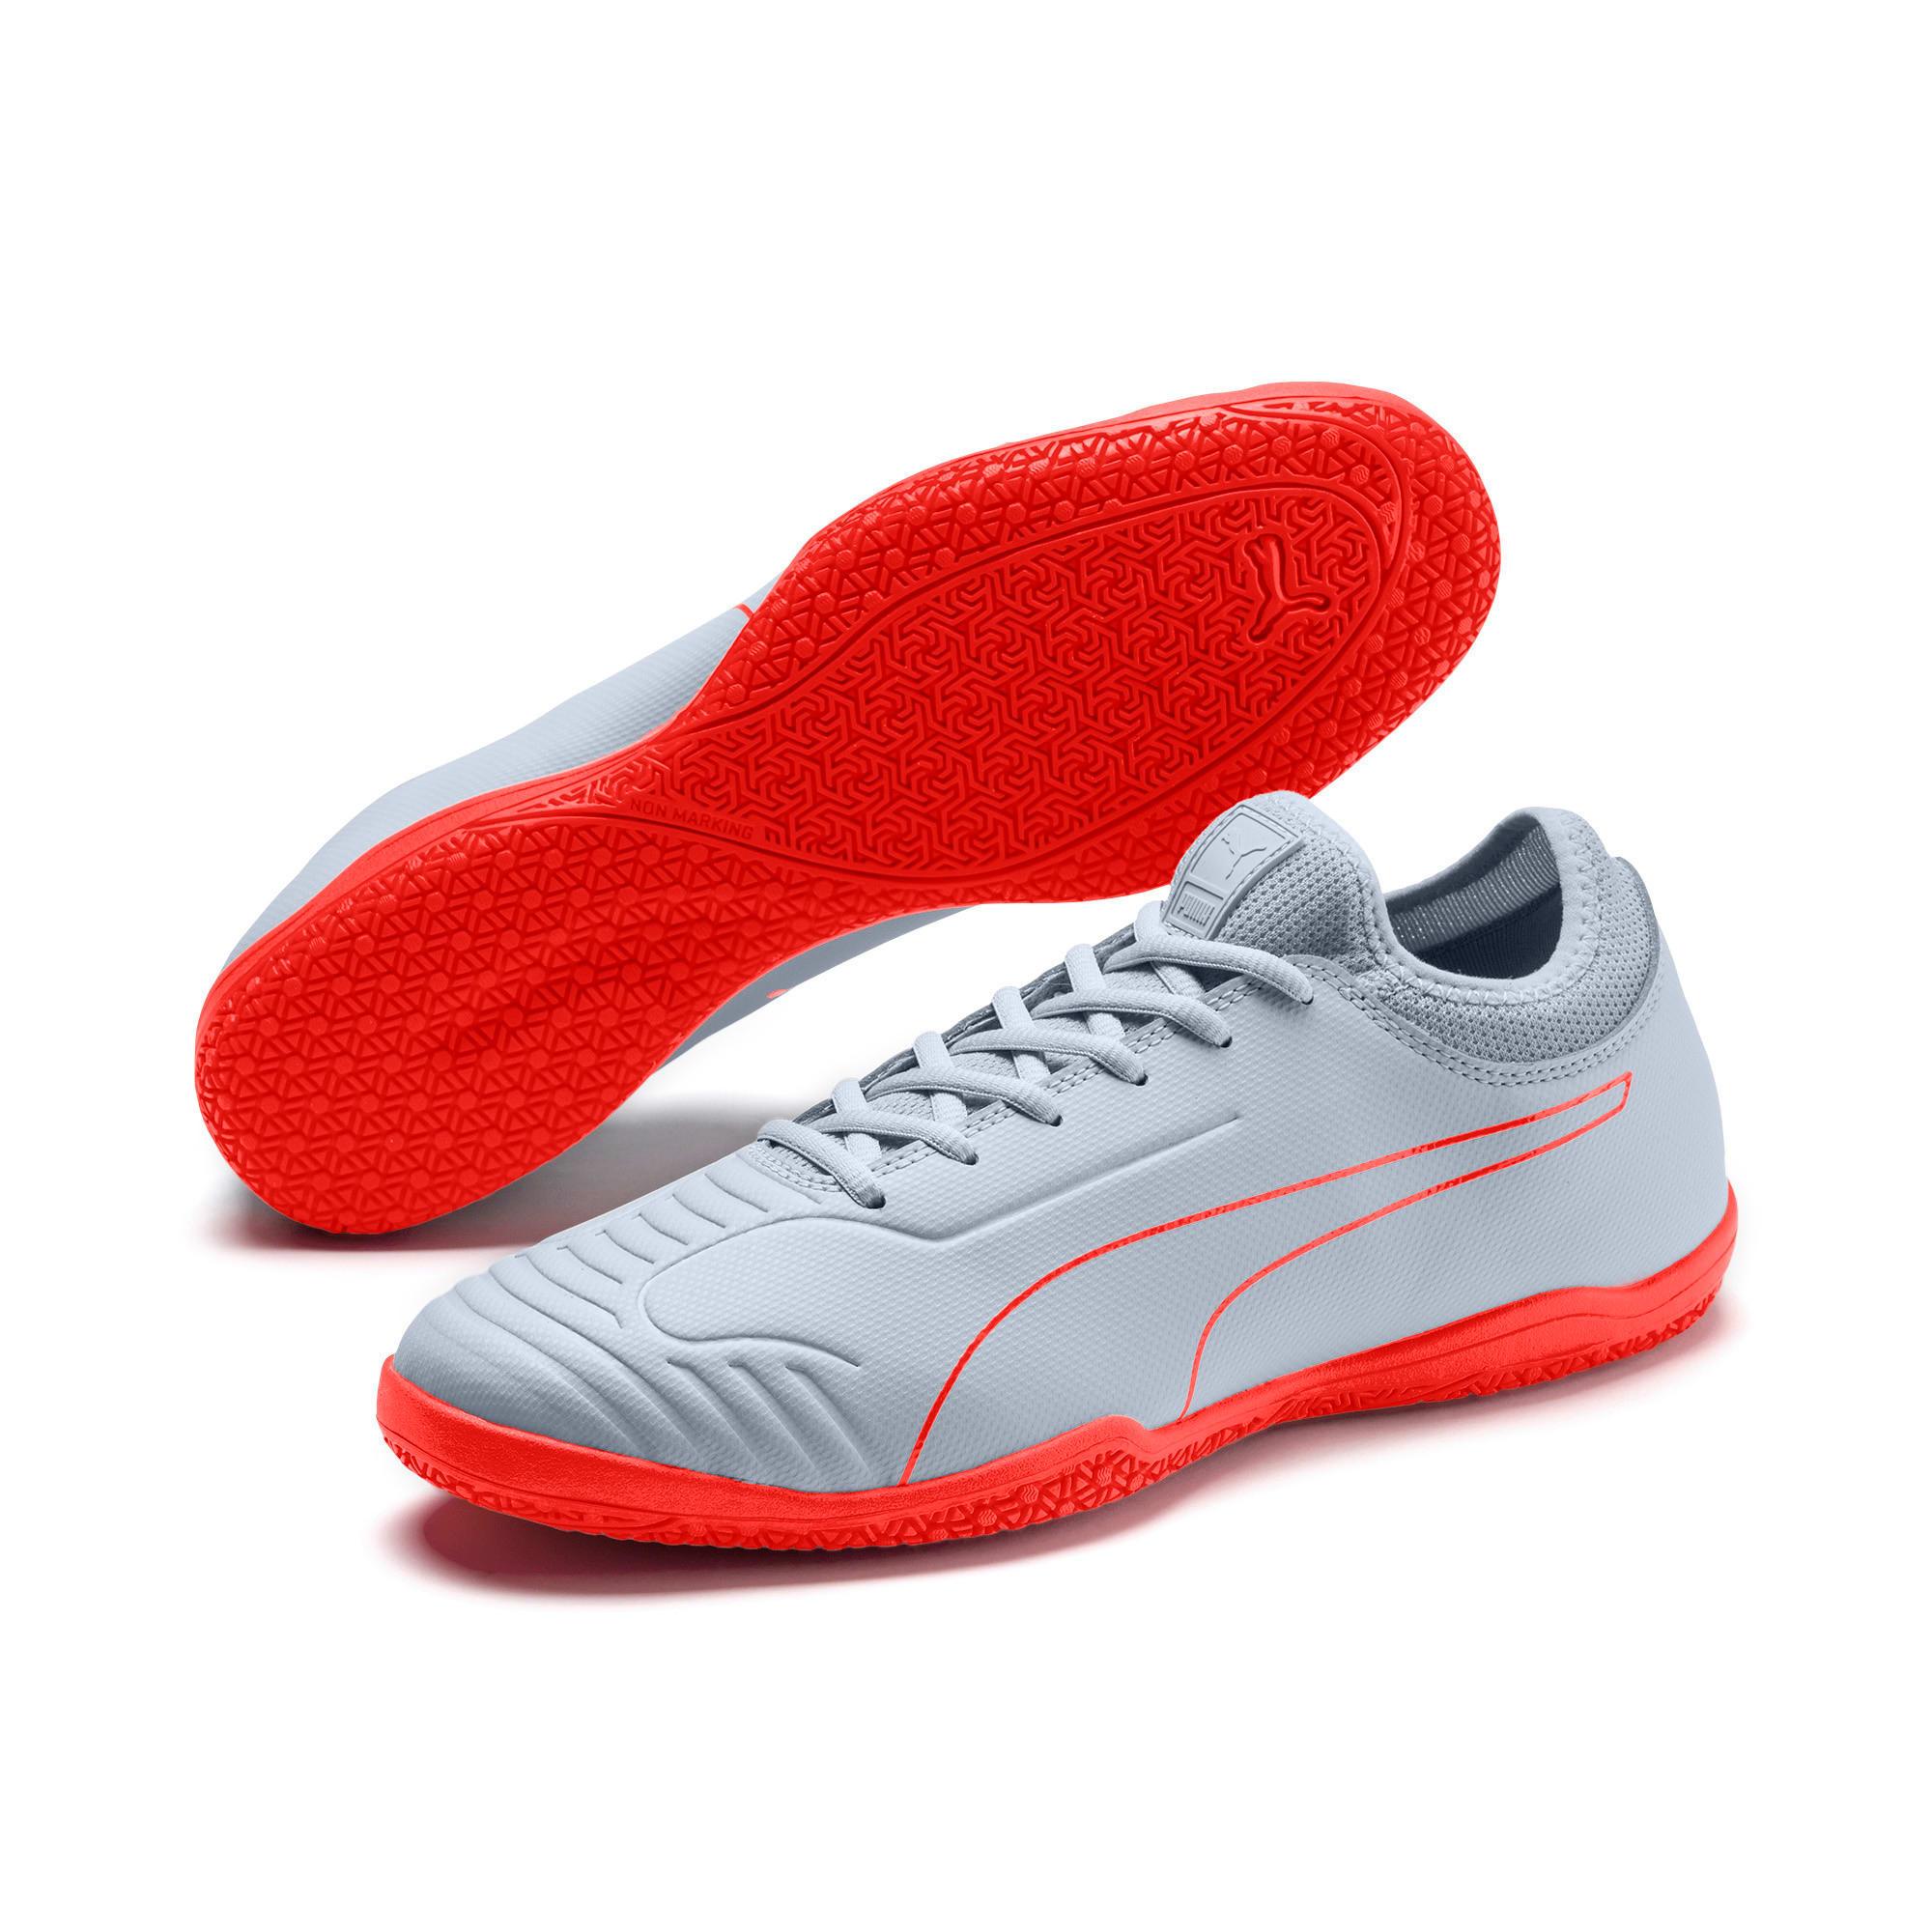 Thumbnail 2 of 365 Sala 2 Men's Soccer Shoes, Grey Dawn-Nrgy Red, medium